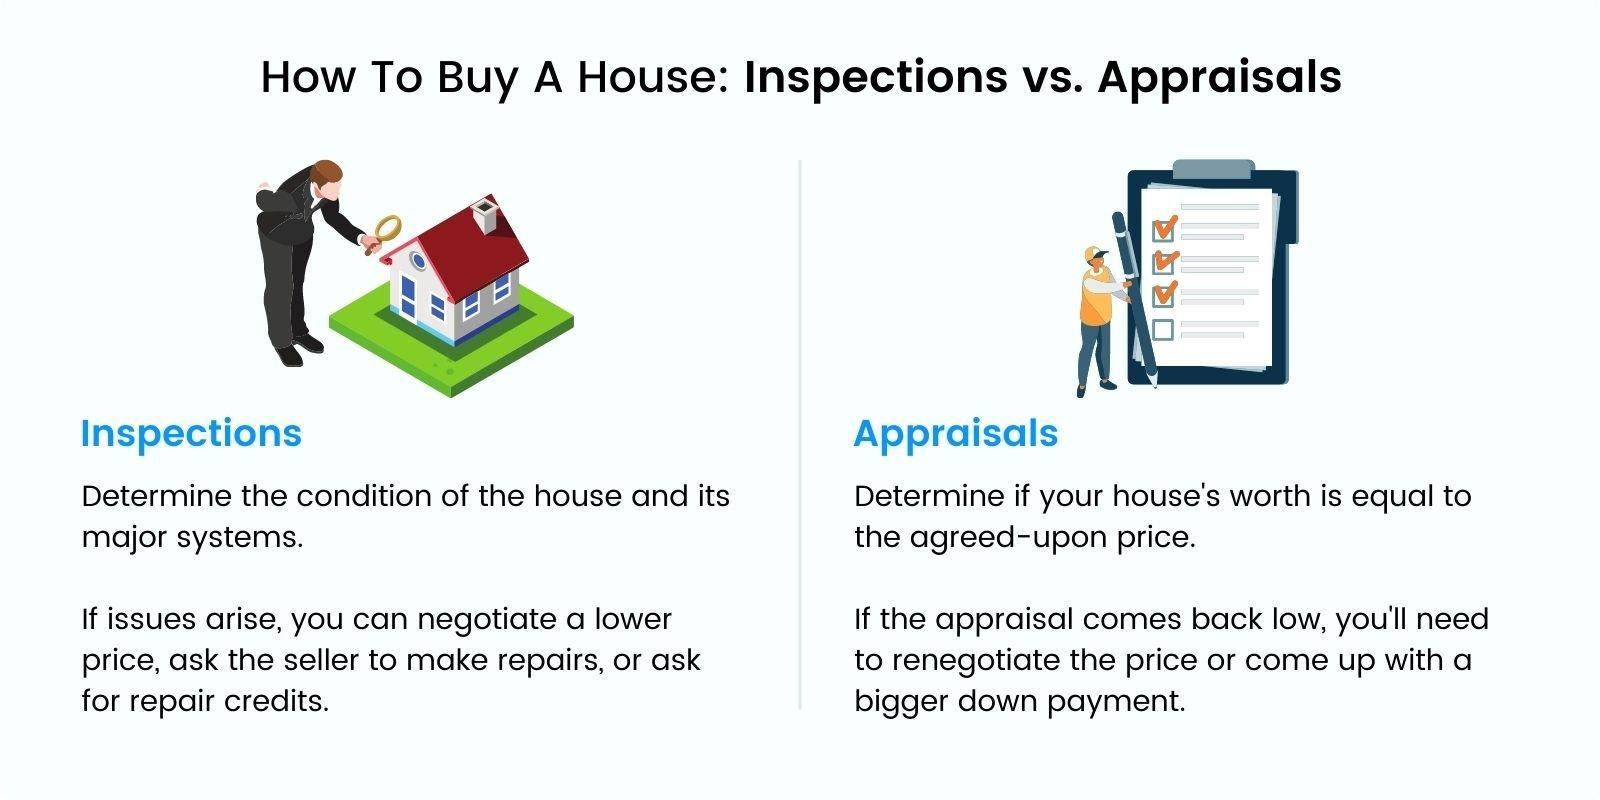 Inspections vs Appraisals